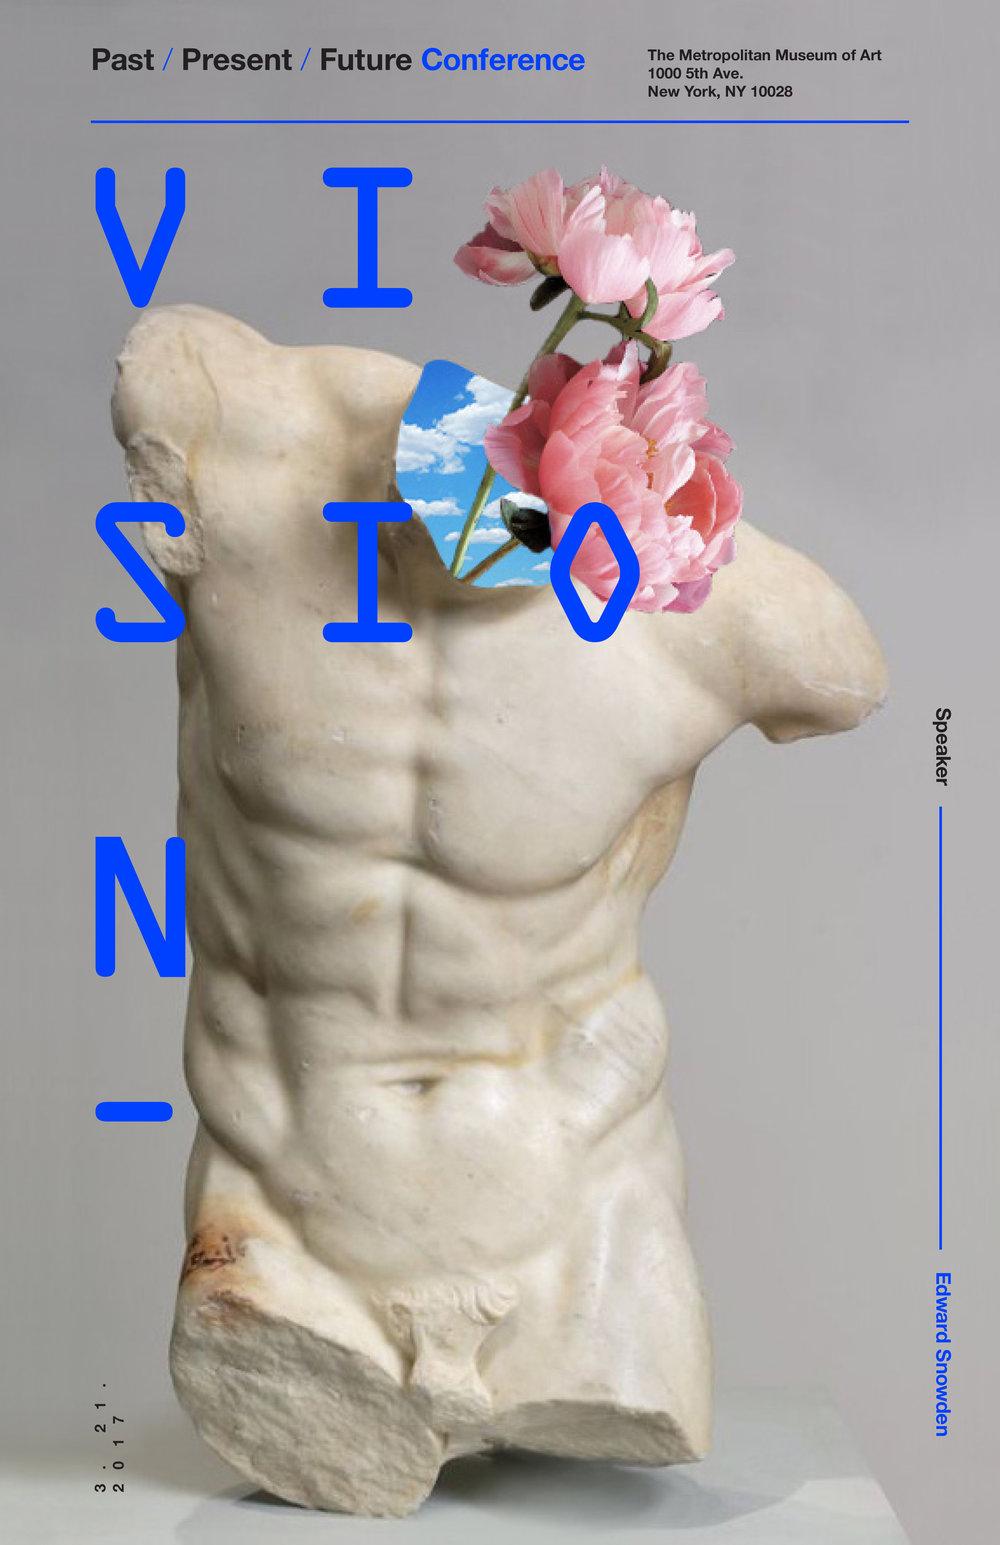 StatuesPostersNEW-4 copy.jpg